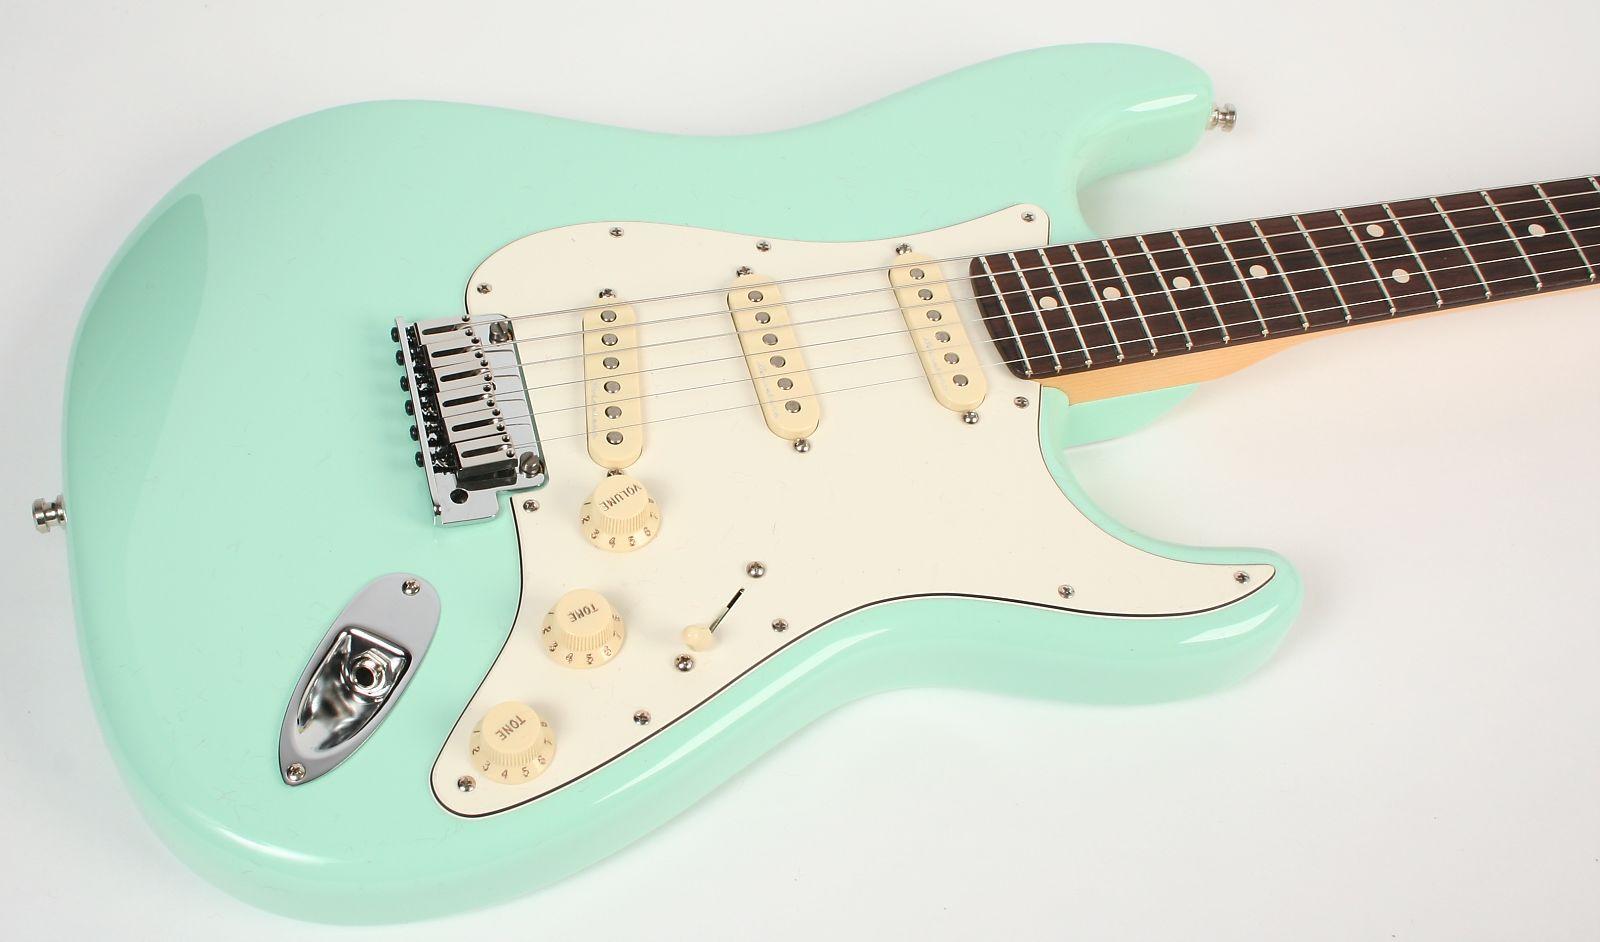 Fender Custom Shop Jeff Beck Signature Stratocaster Surf Green